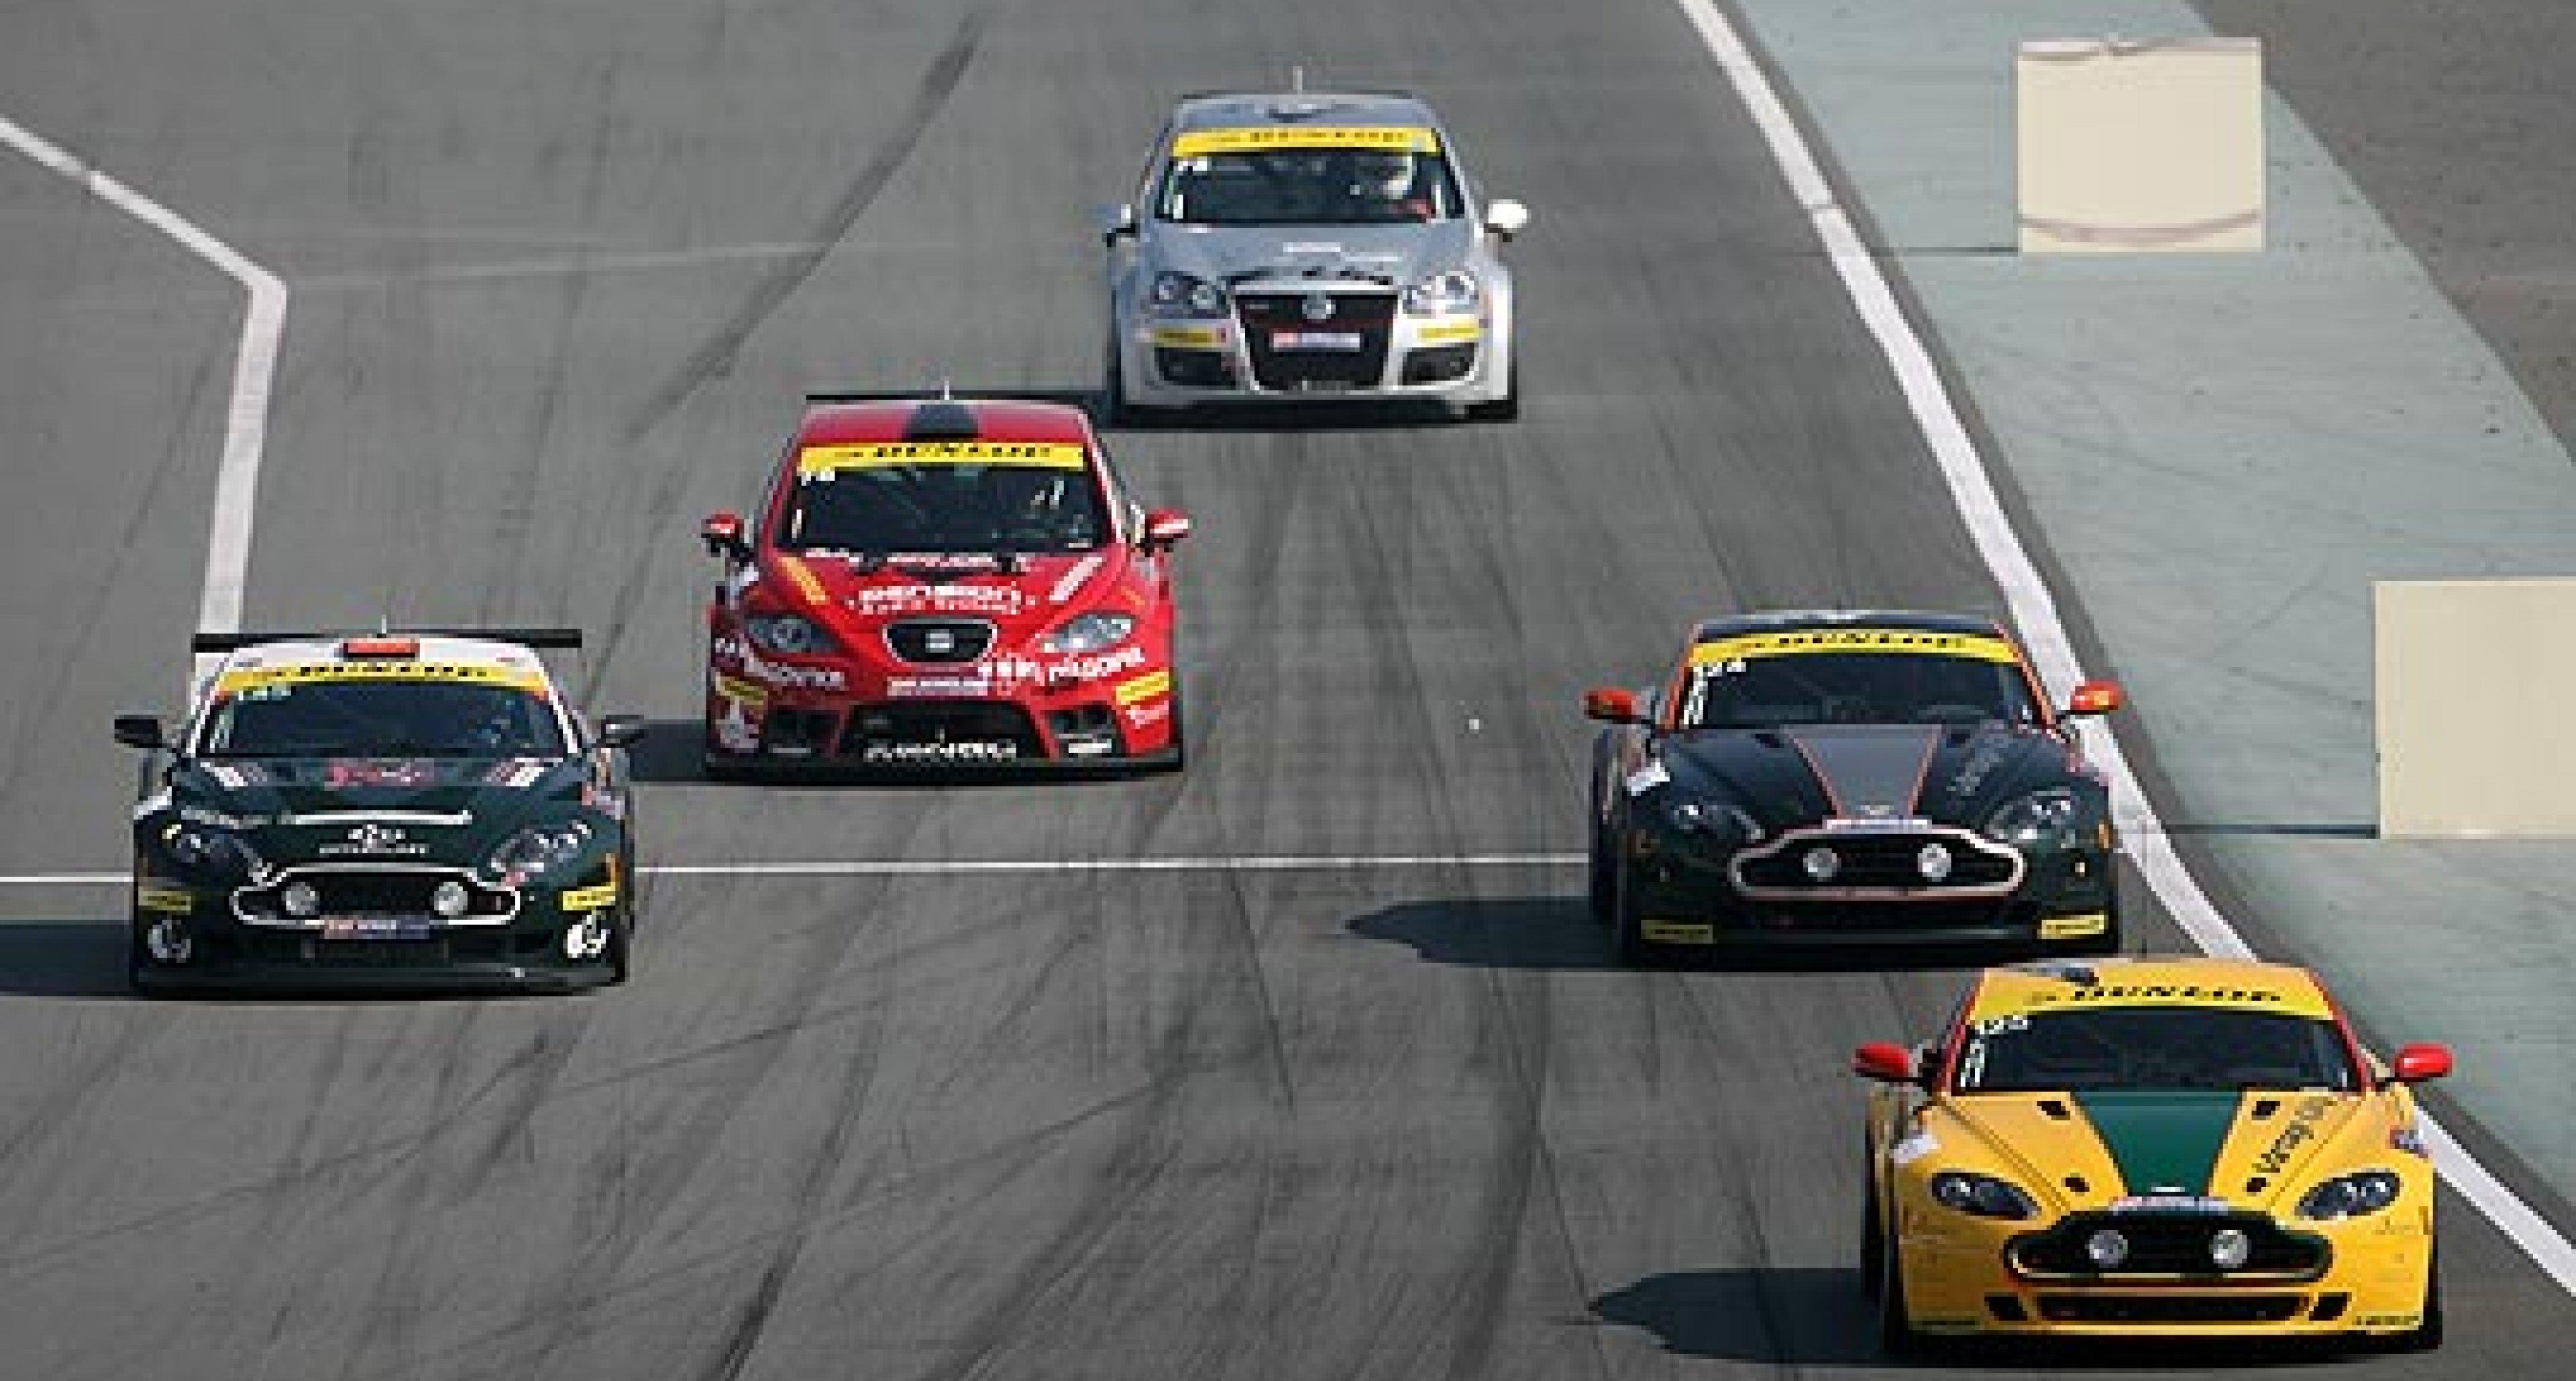 Nicholas Mee Racing Scoops Podium at Dubai 24 Hours